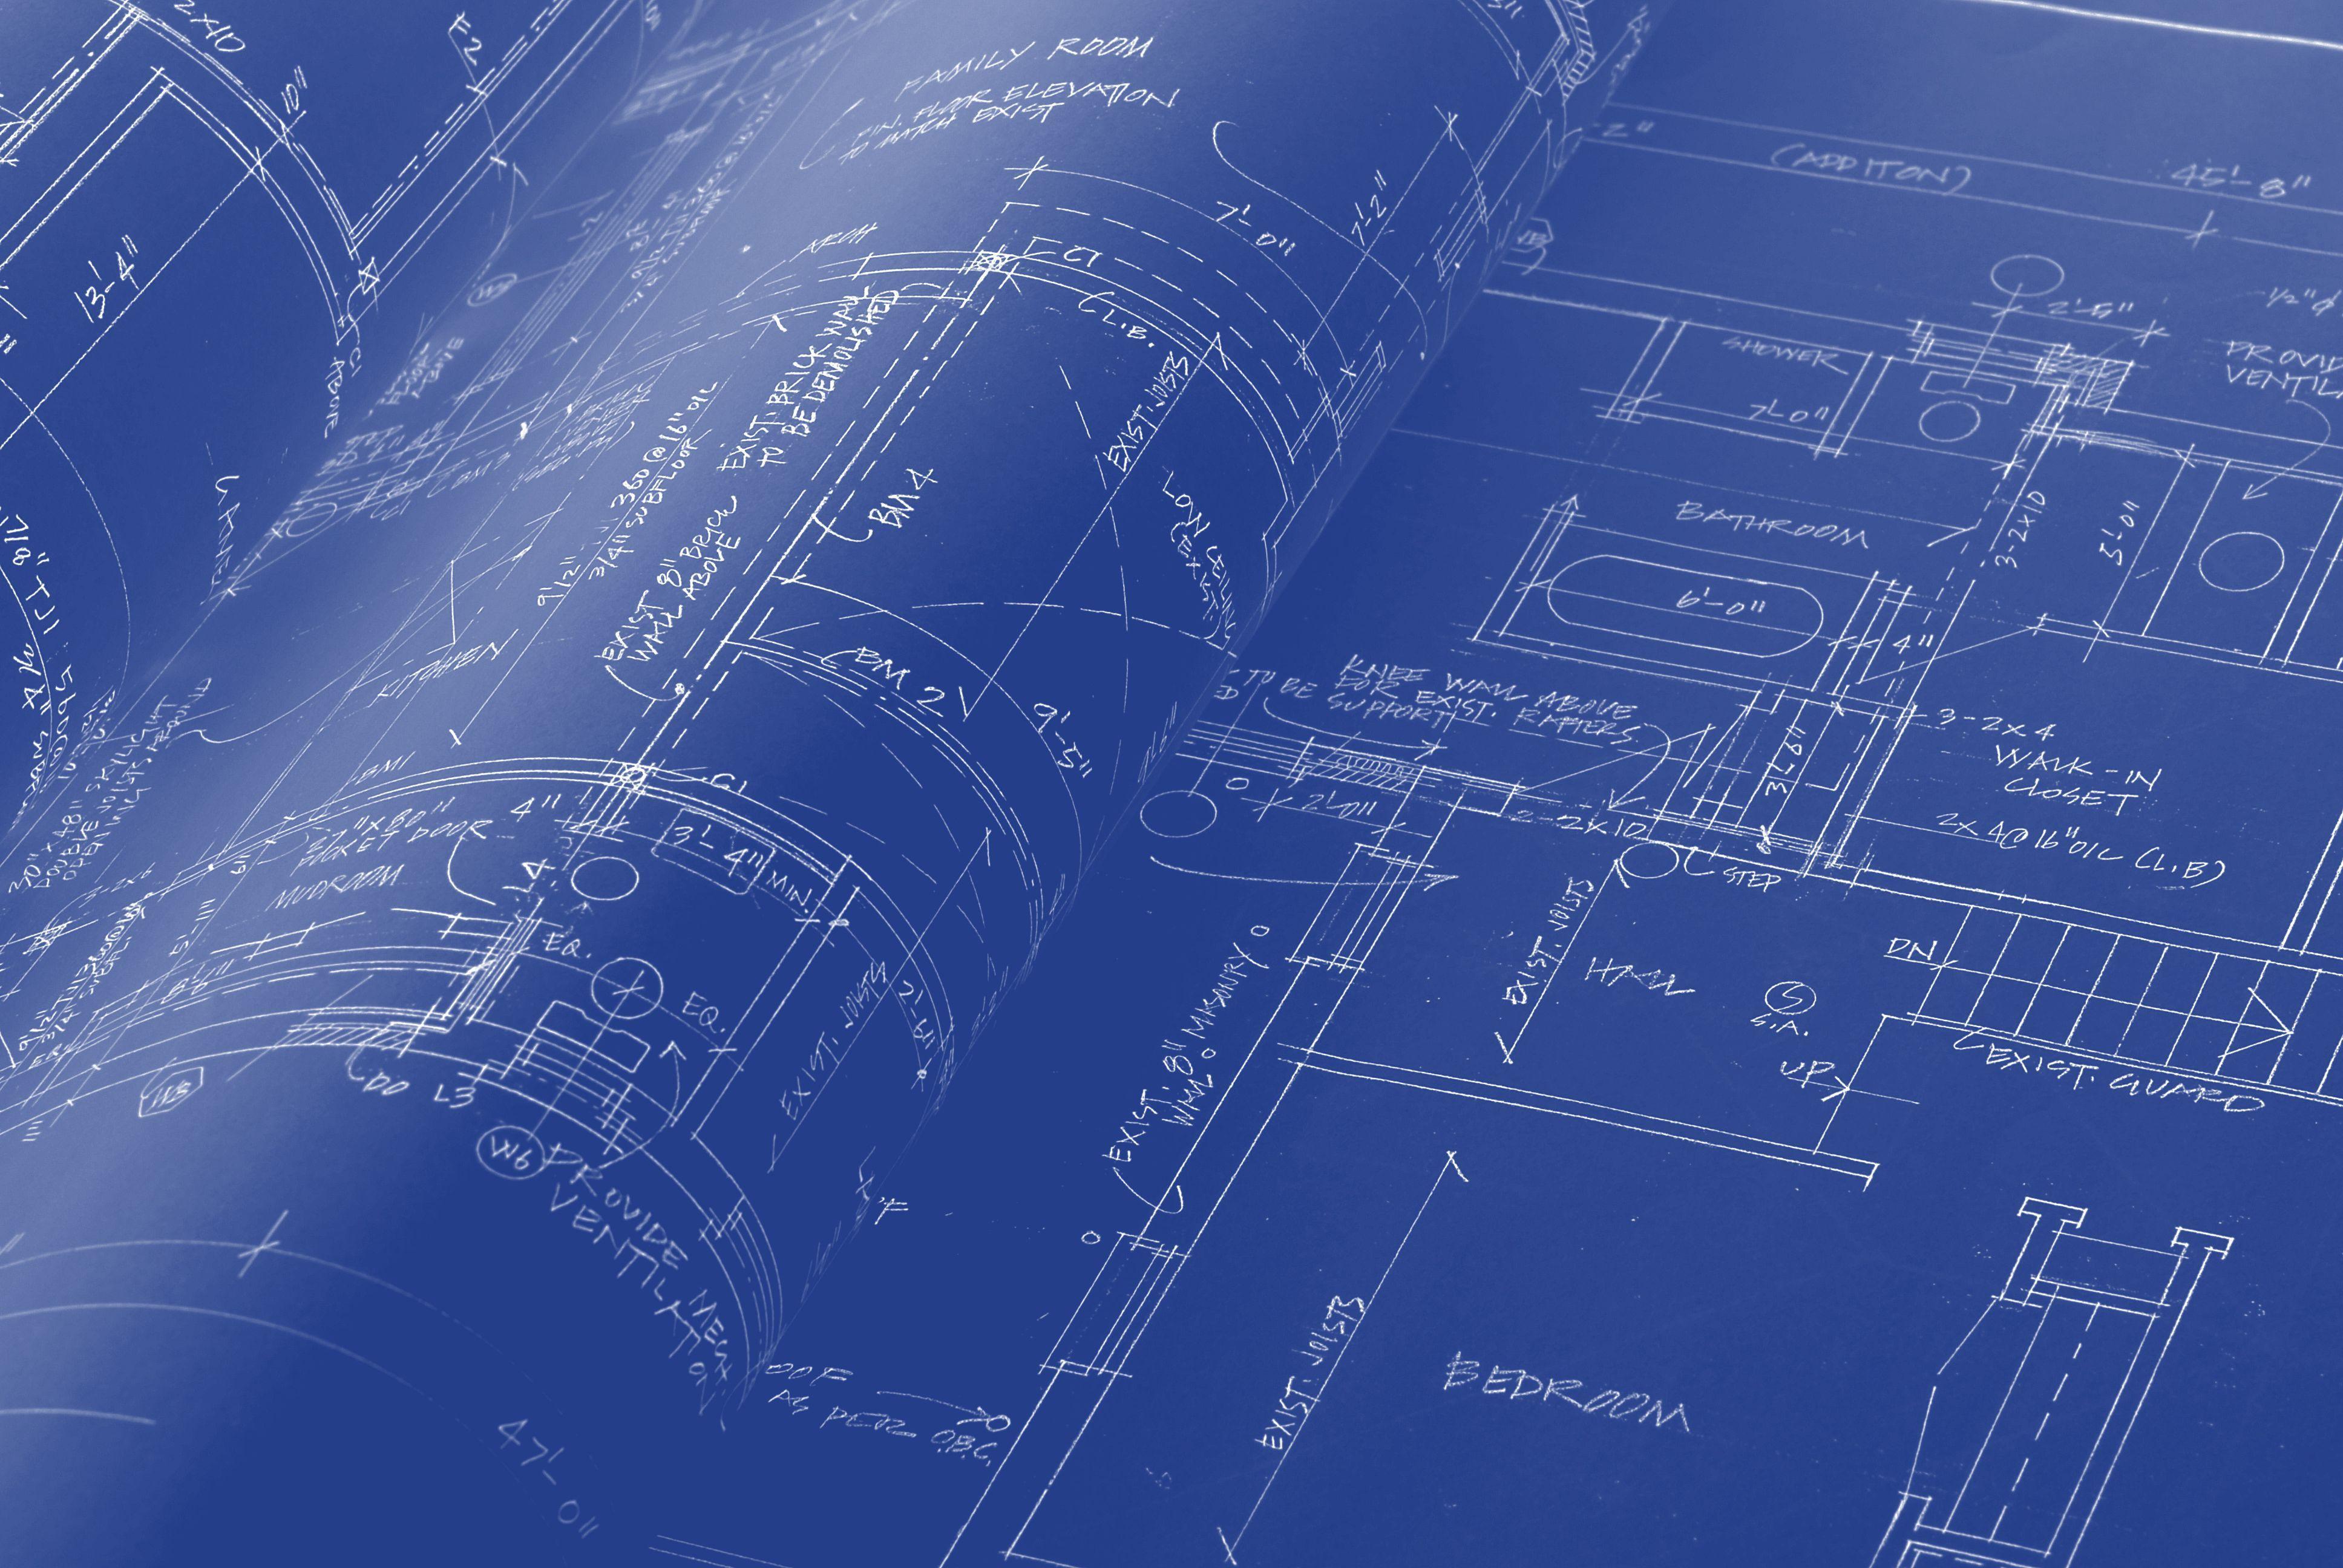 How to make blueprint paper malvernweather Choice Image